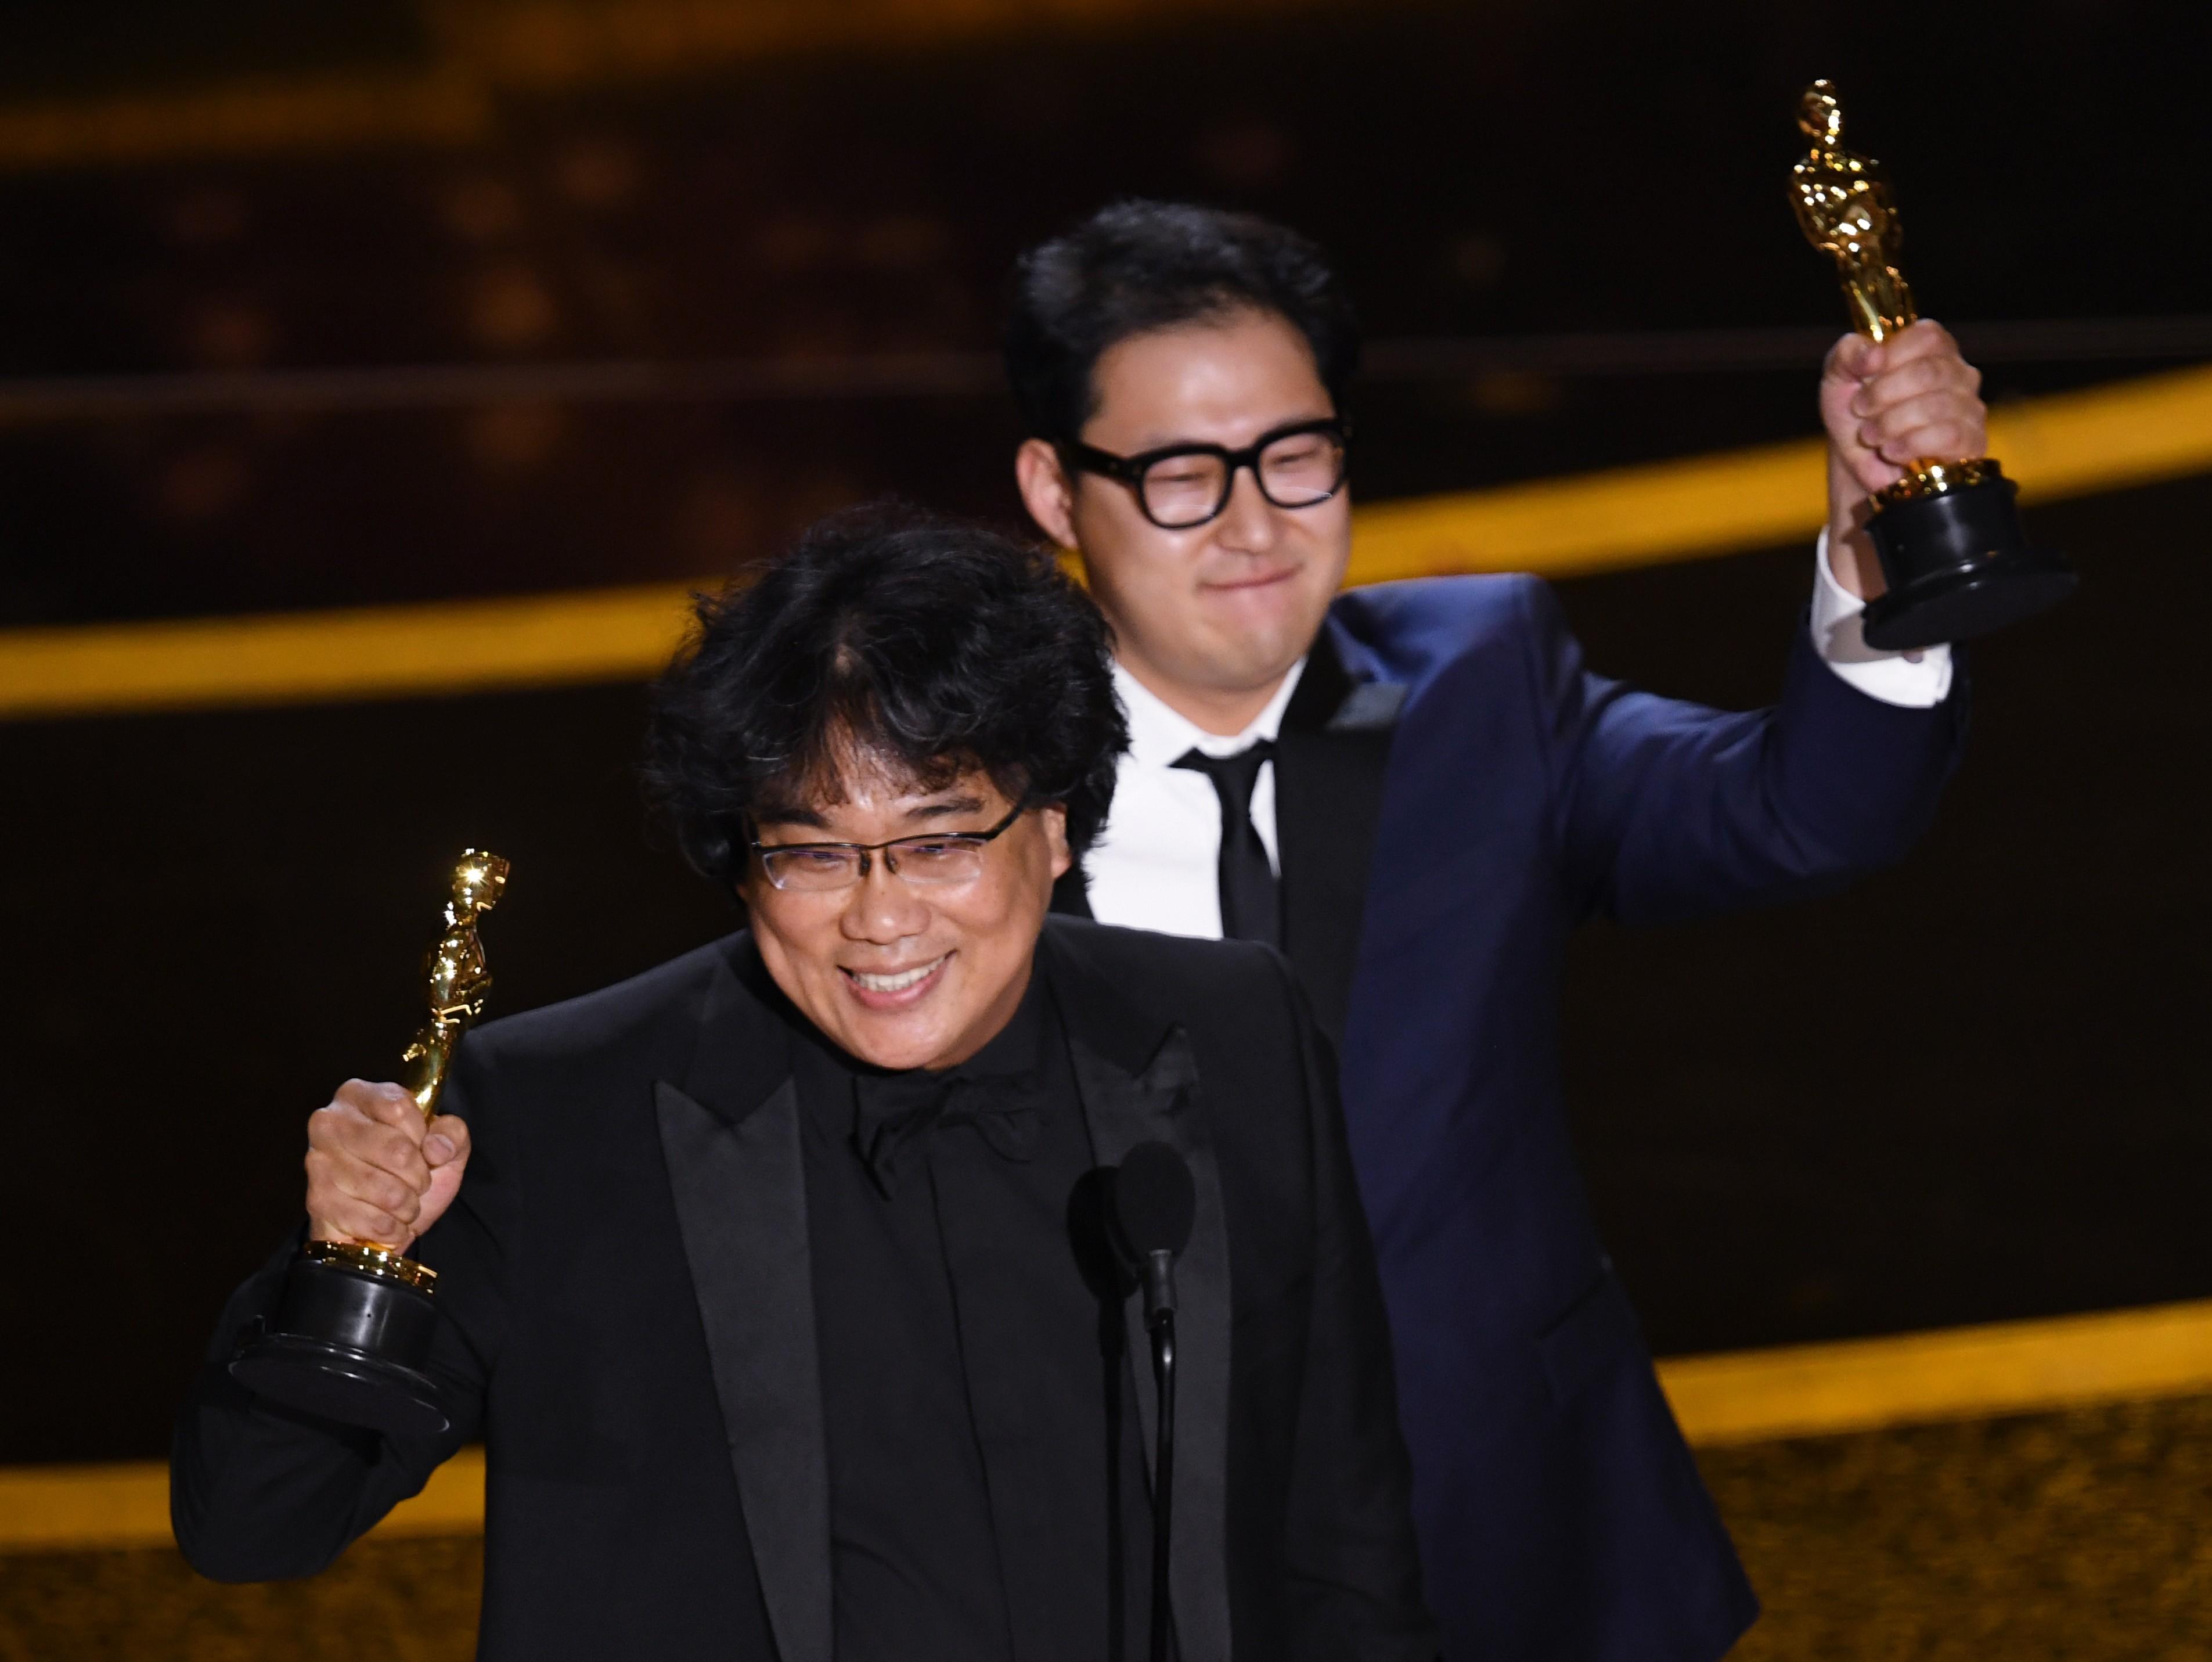 Bong Joon-ho e Han Jin-won após receber o Oscar de Melhor Roteiro Original por 'Parasita' Kevin Winter/Getty Images/AFP